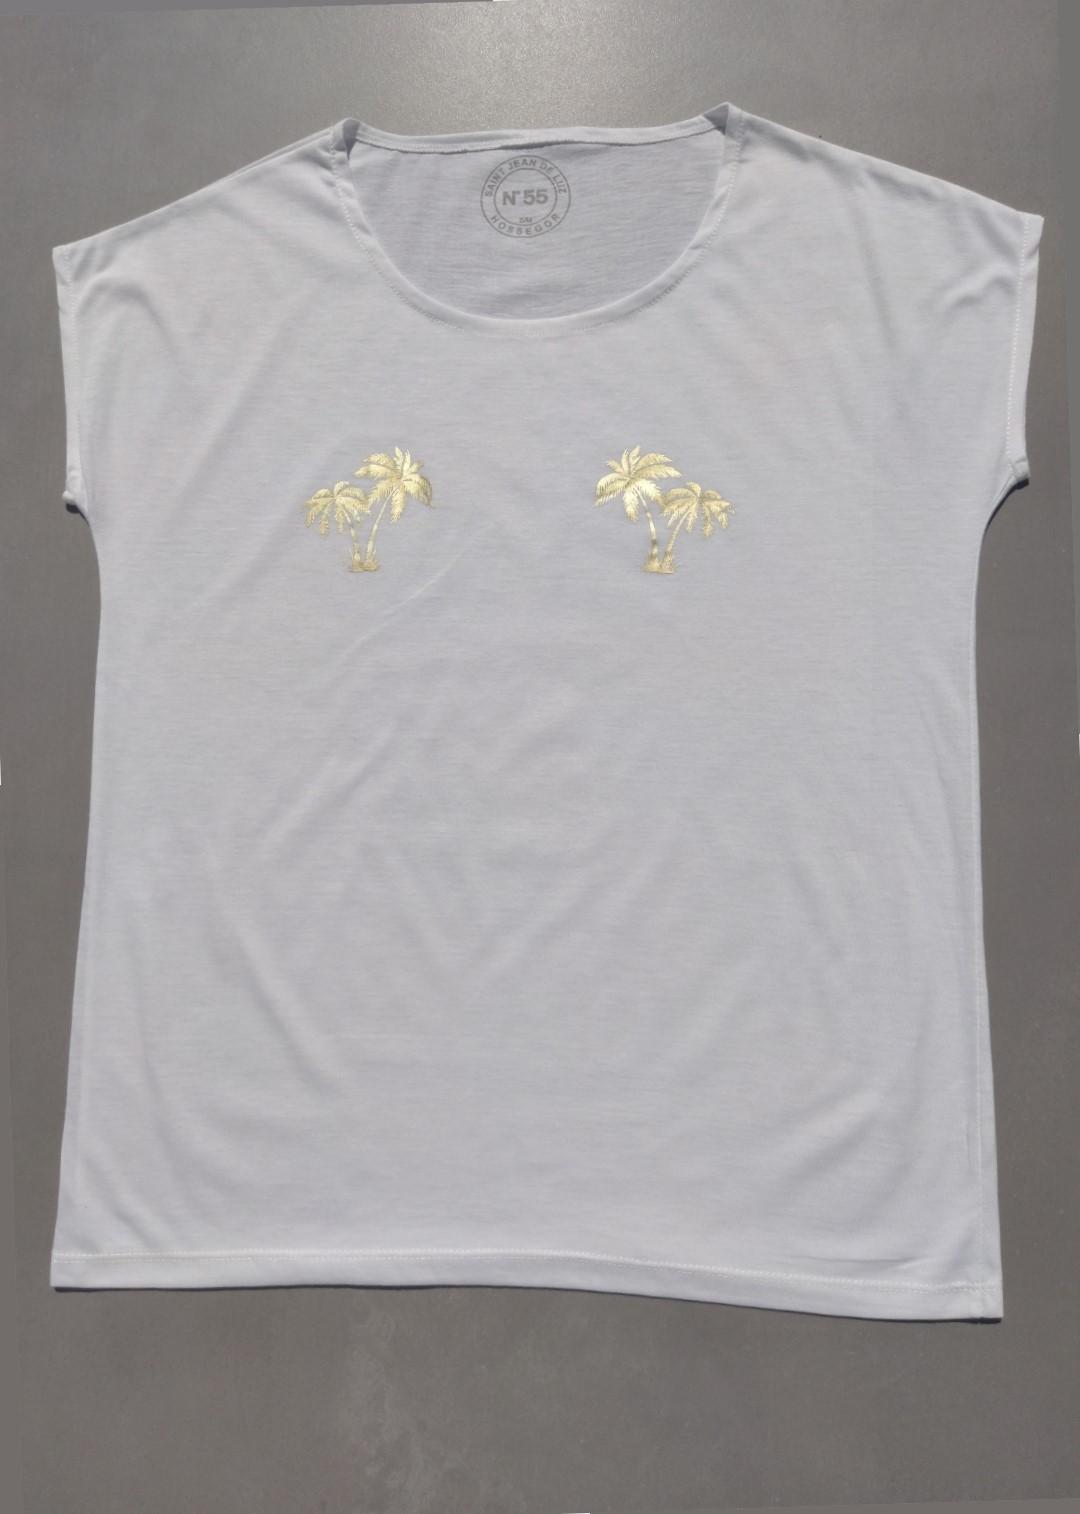 Tee shirt blanc N°55 palmiers or.